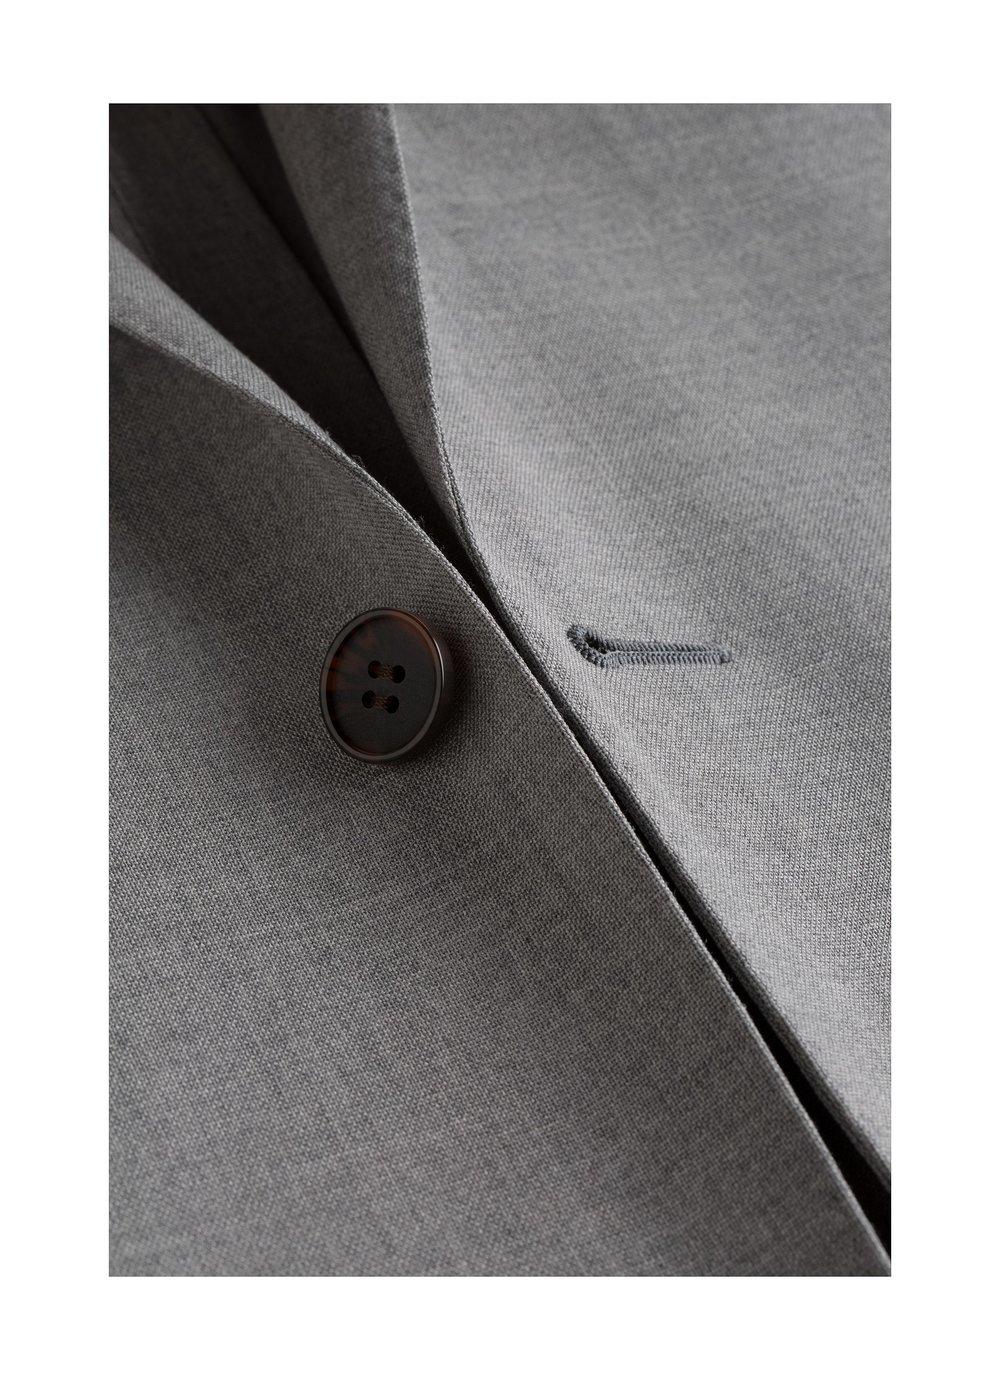 Suits_Light_Grey_Plain_Havana_Traveler_Unlined_P5184_Suitsupply_Online_Store_8.jpg